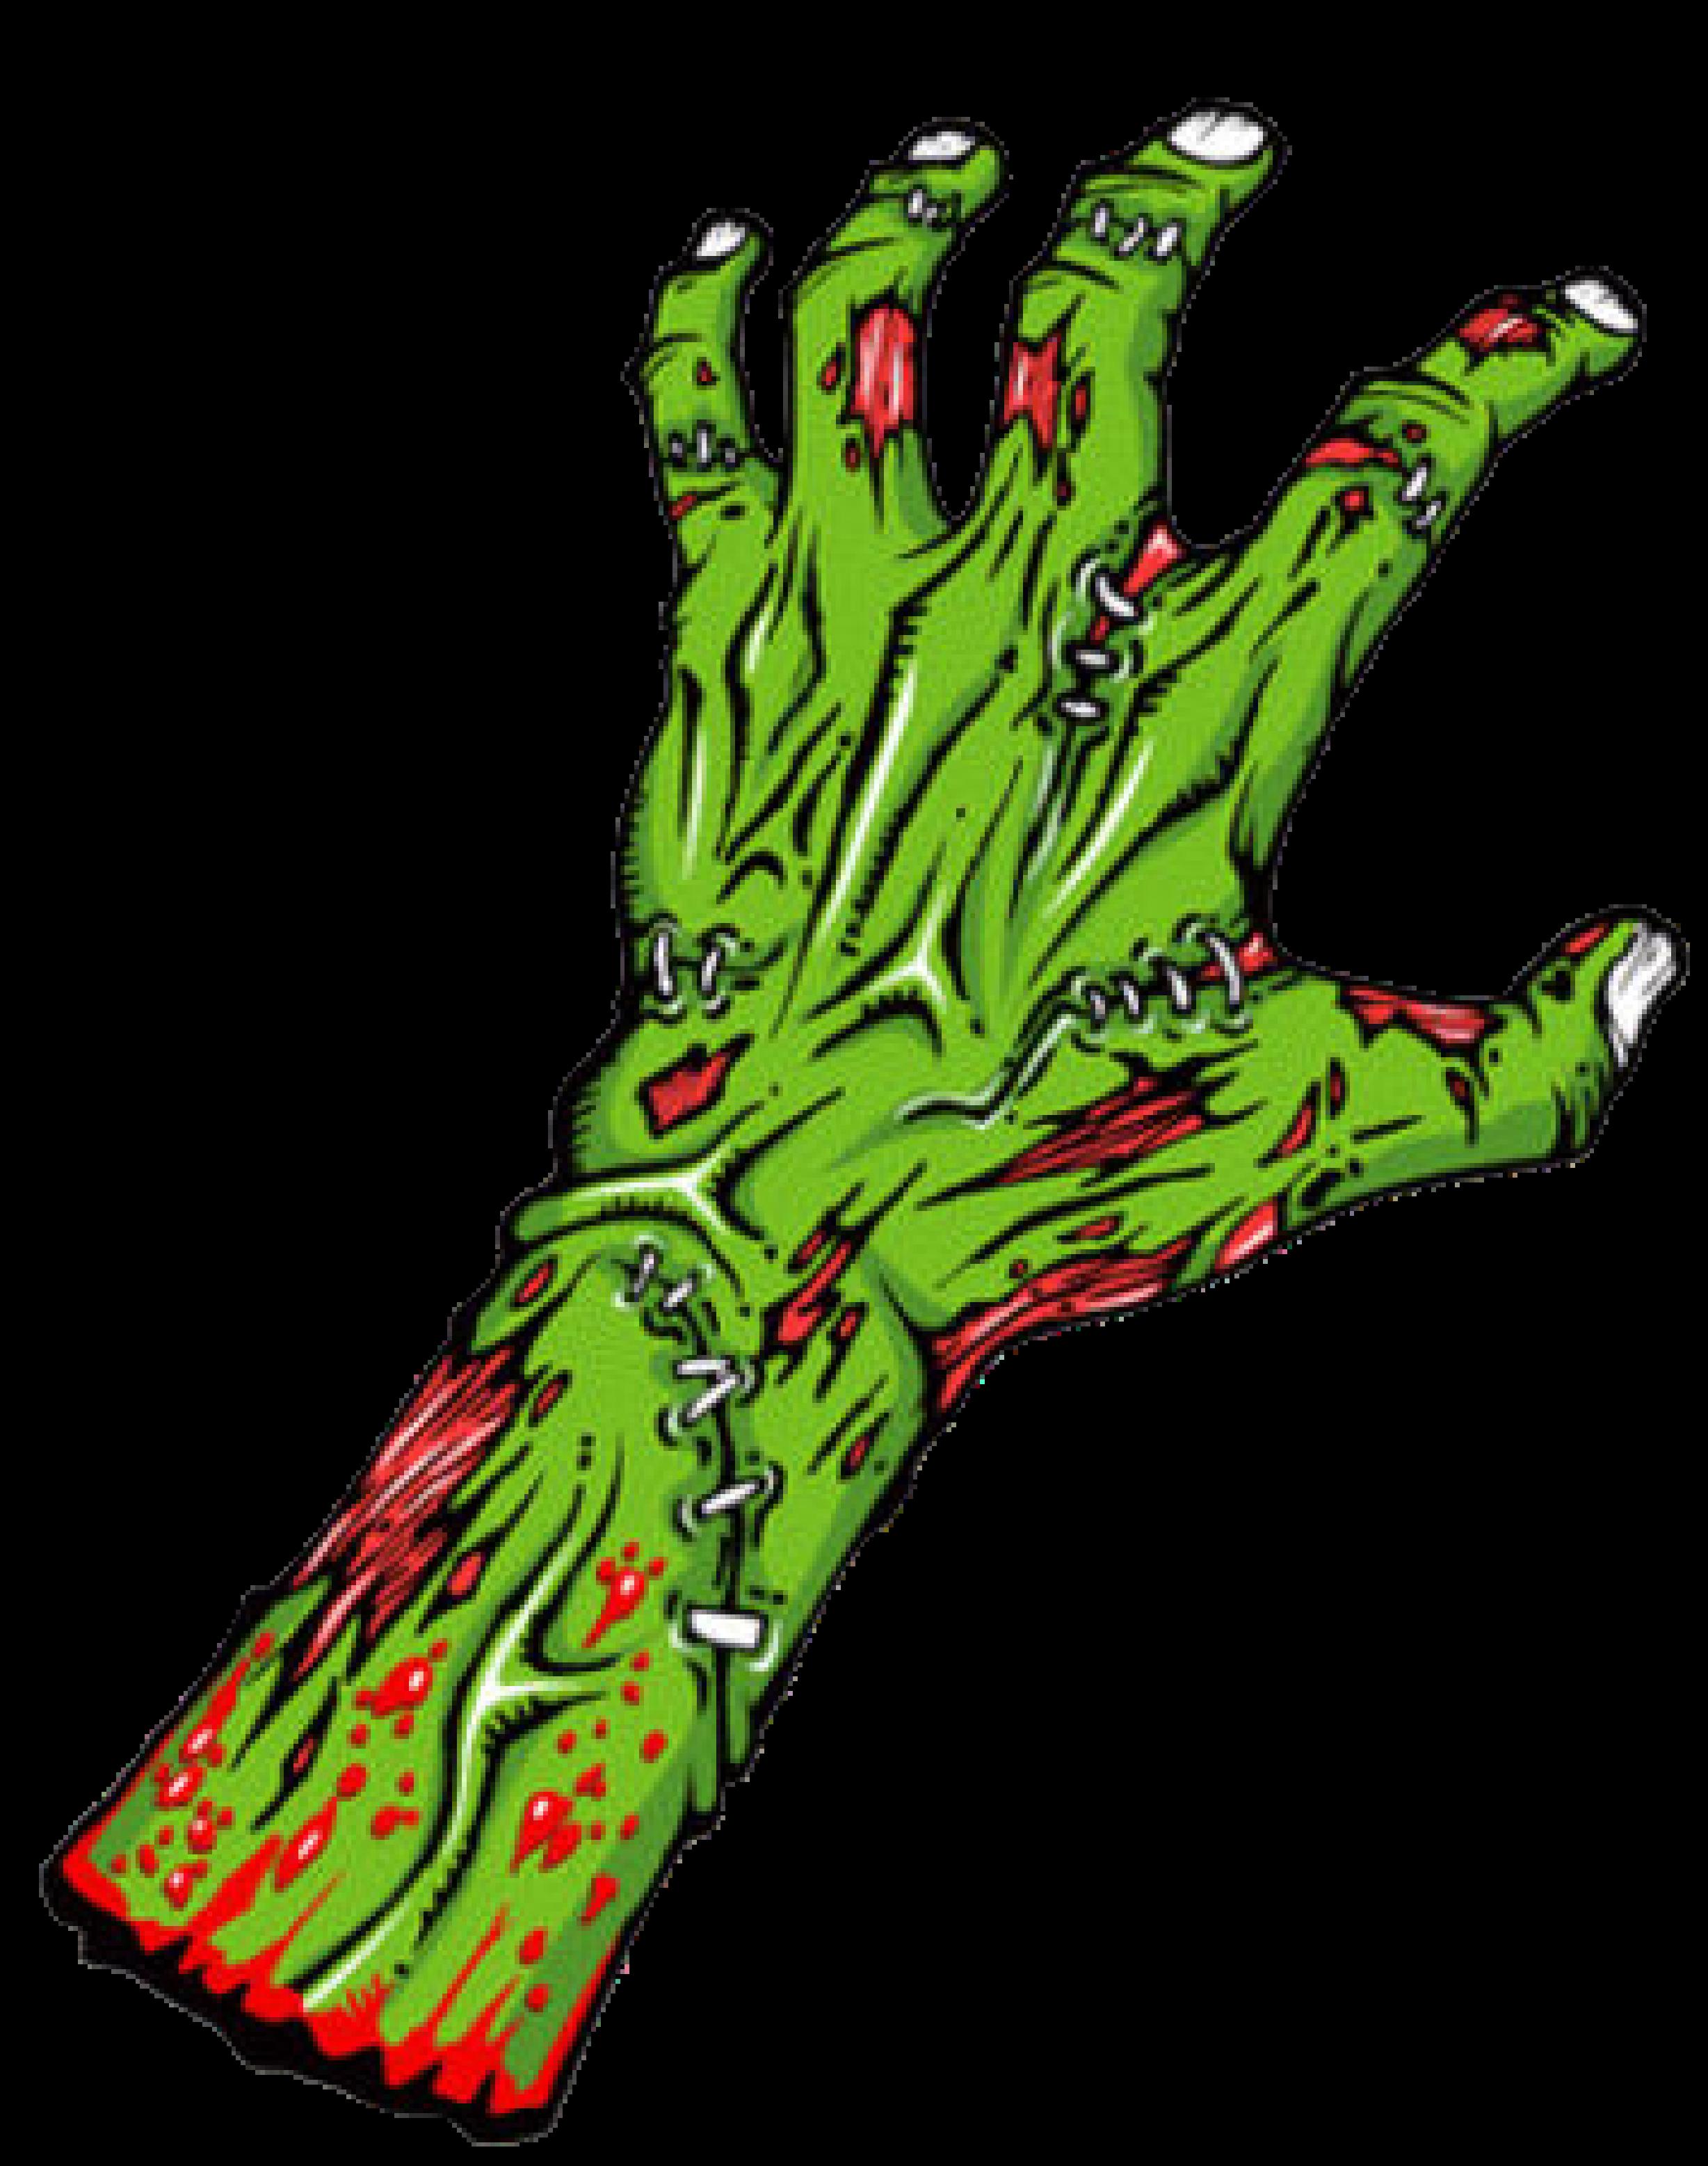 Zombie Hand Cut.